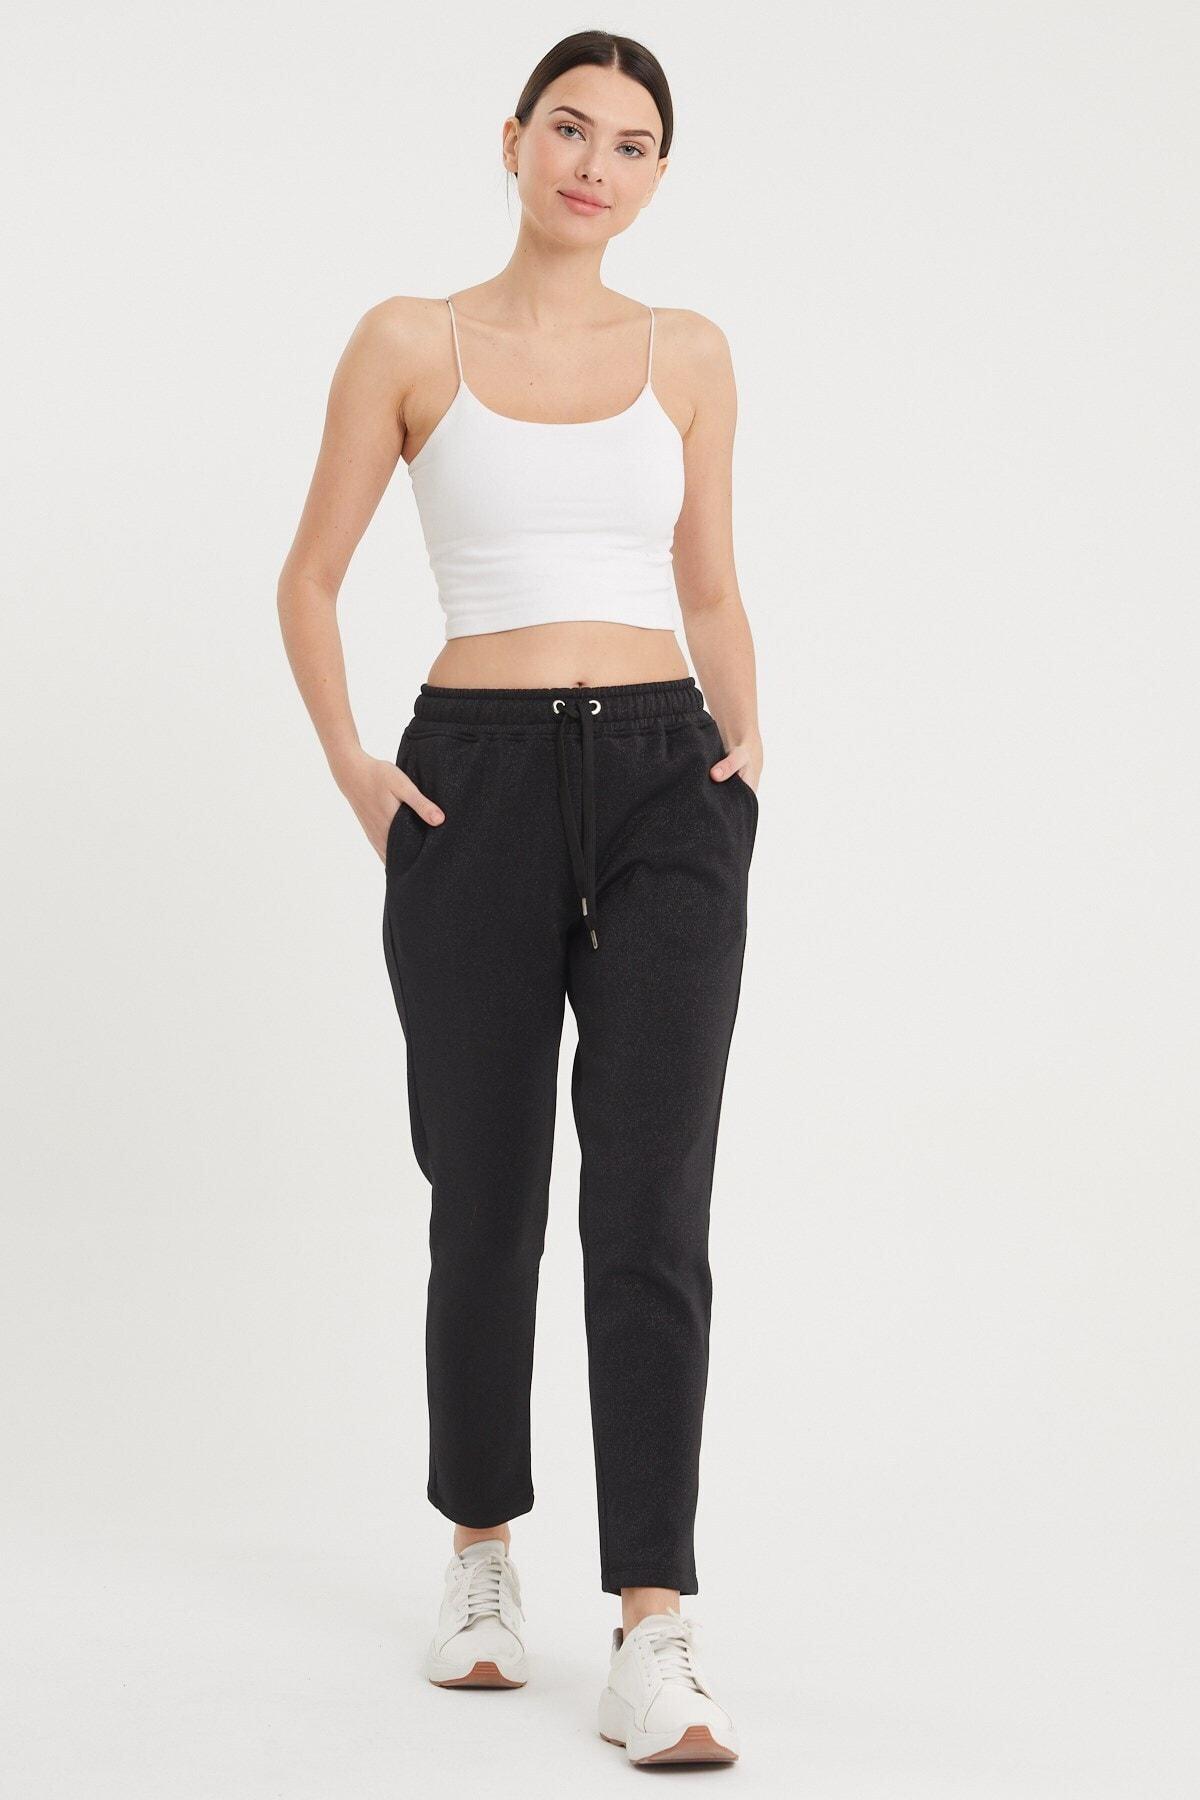 VENA Kadın Siyah Larıssa Simli Joggıng Pantolon 2